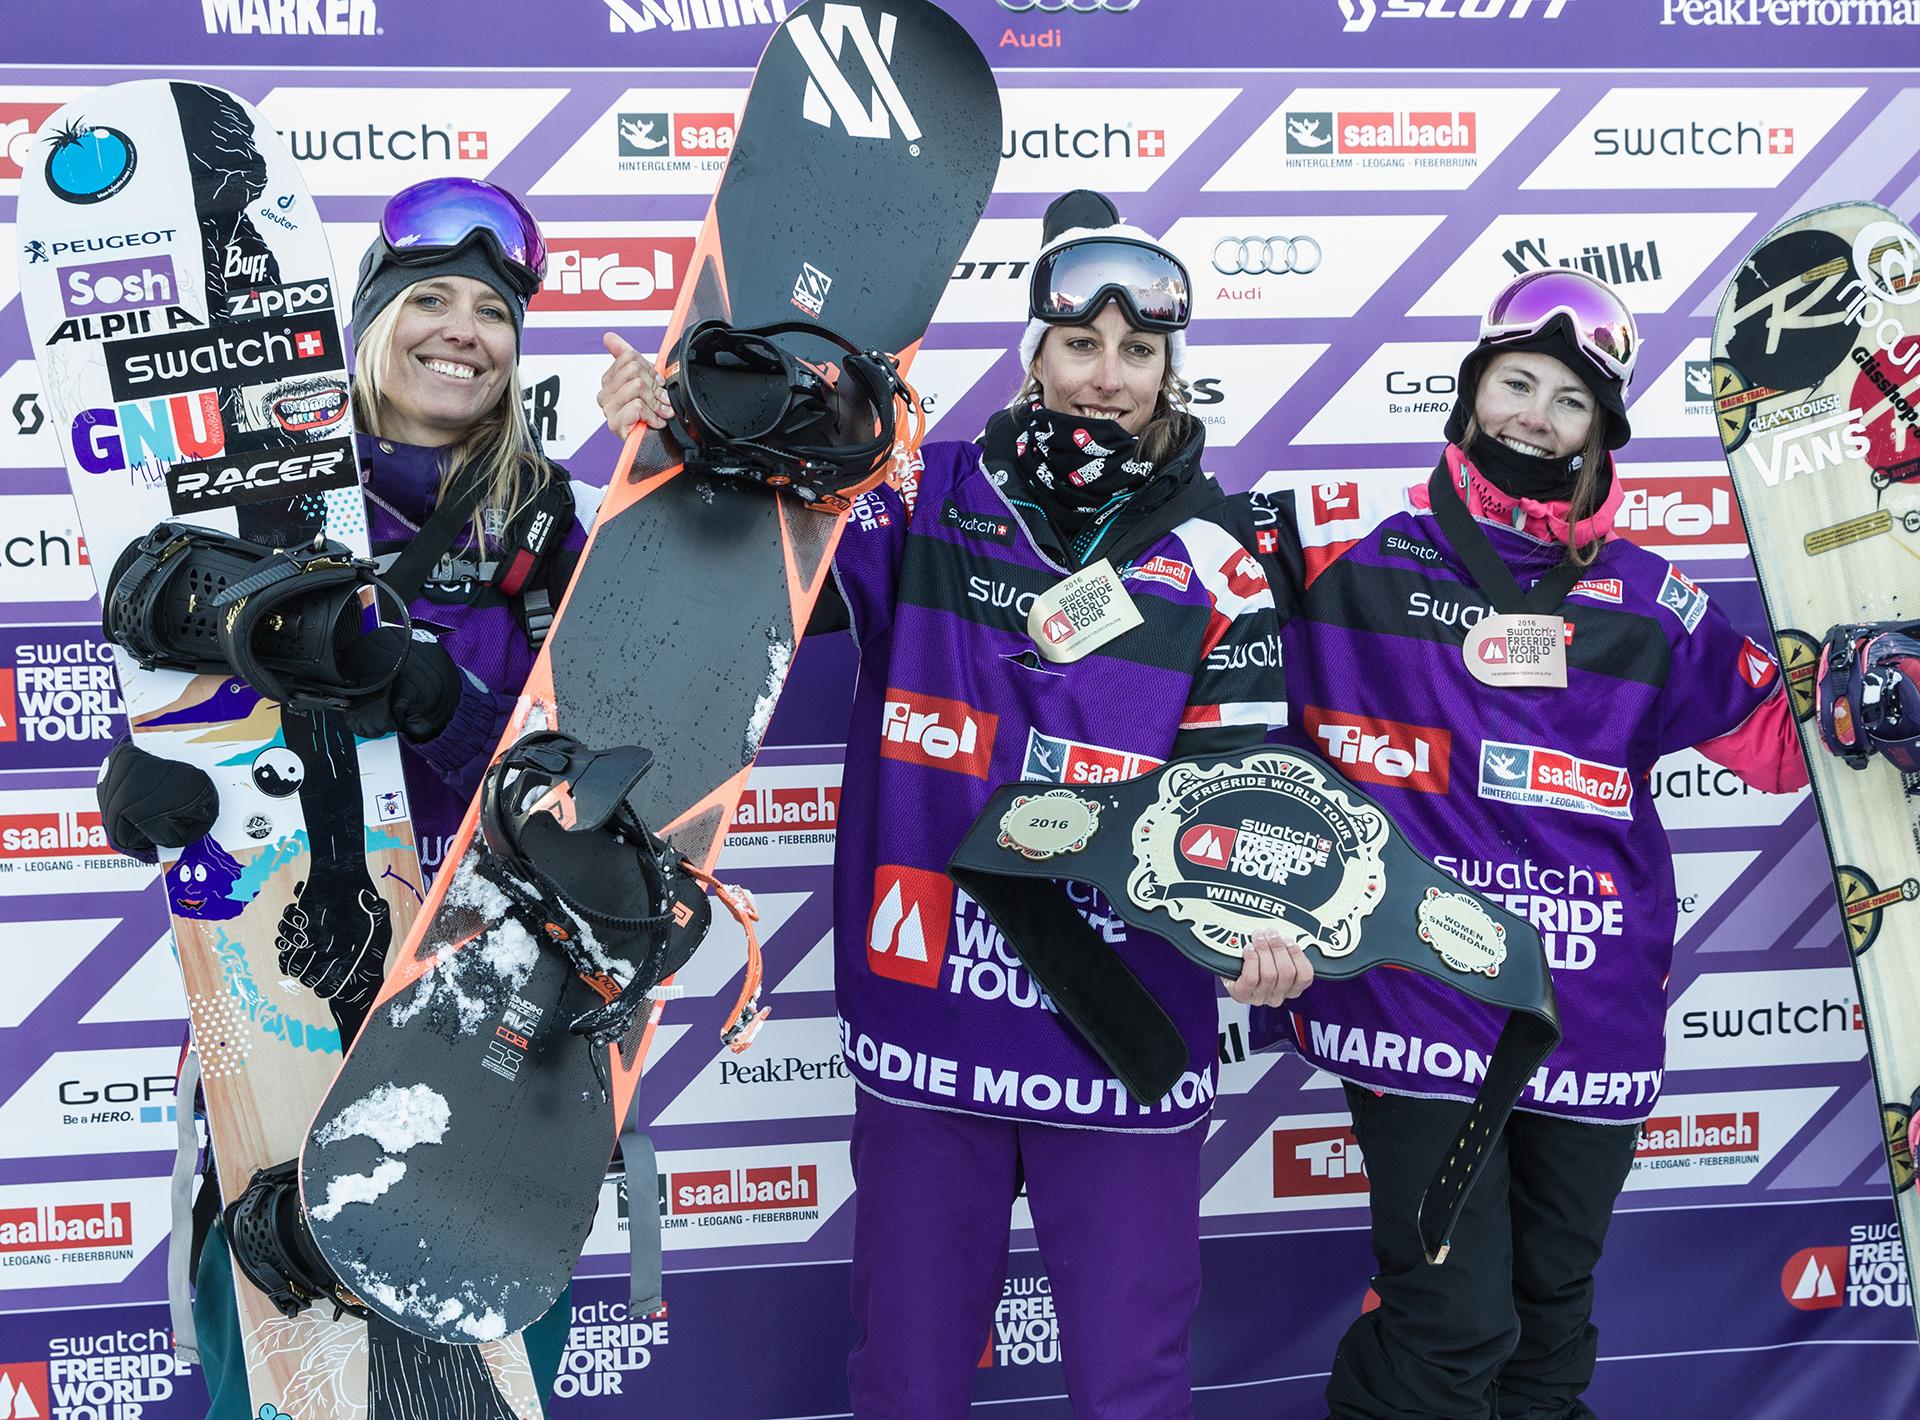 Das Podium der Ladies: Marion Haerty, Elodie Mouthon, Anne-Flore Marxer - Foto: M. Knoll / freerideworldtour.com